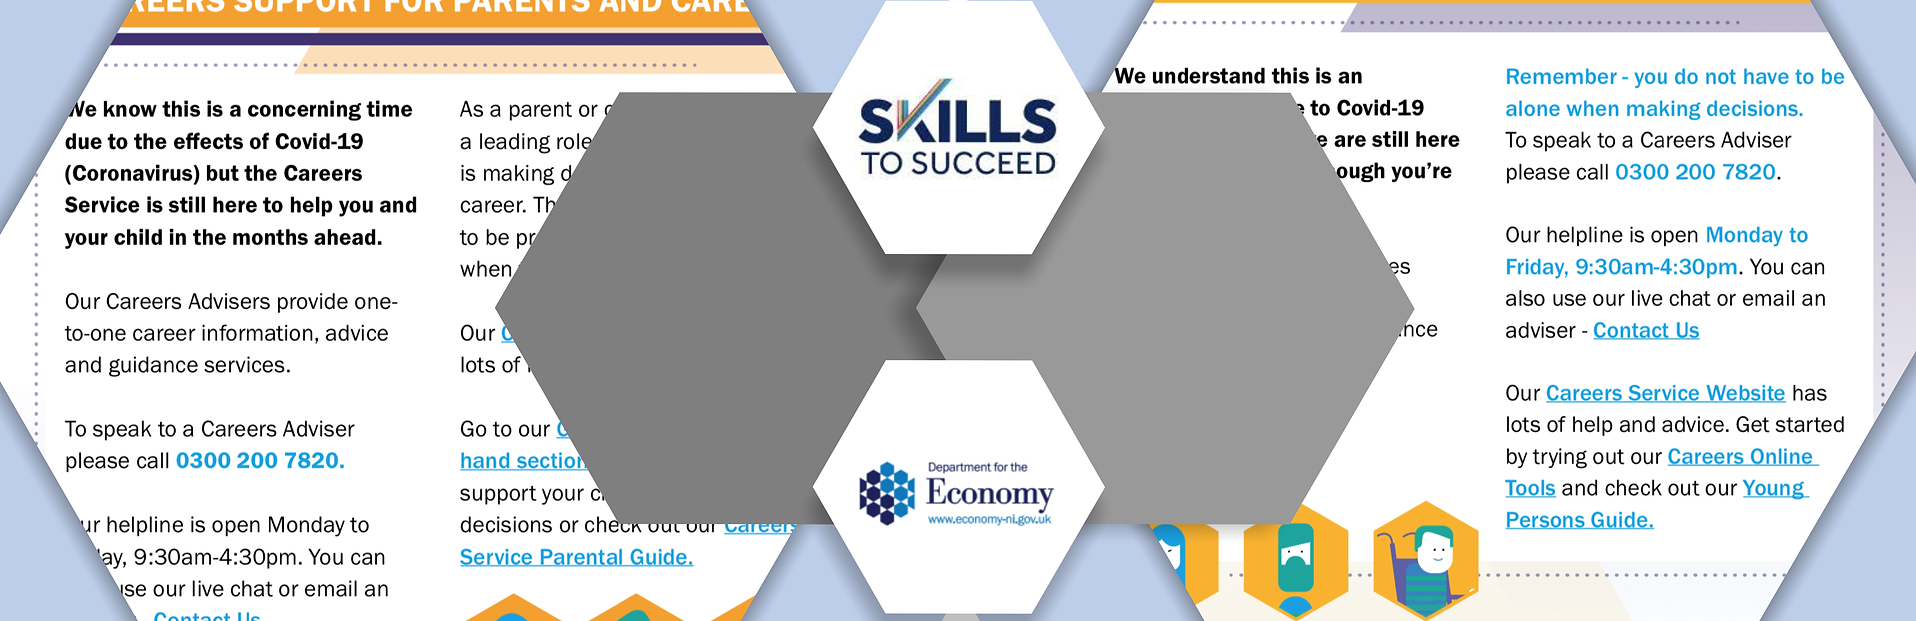 SkillsBG.png